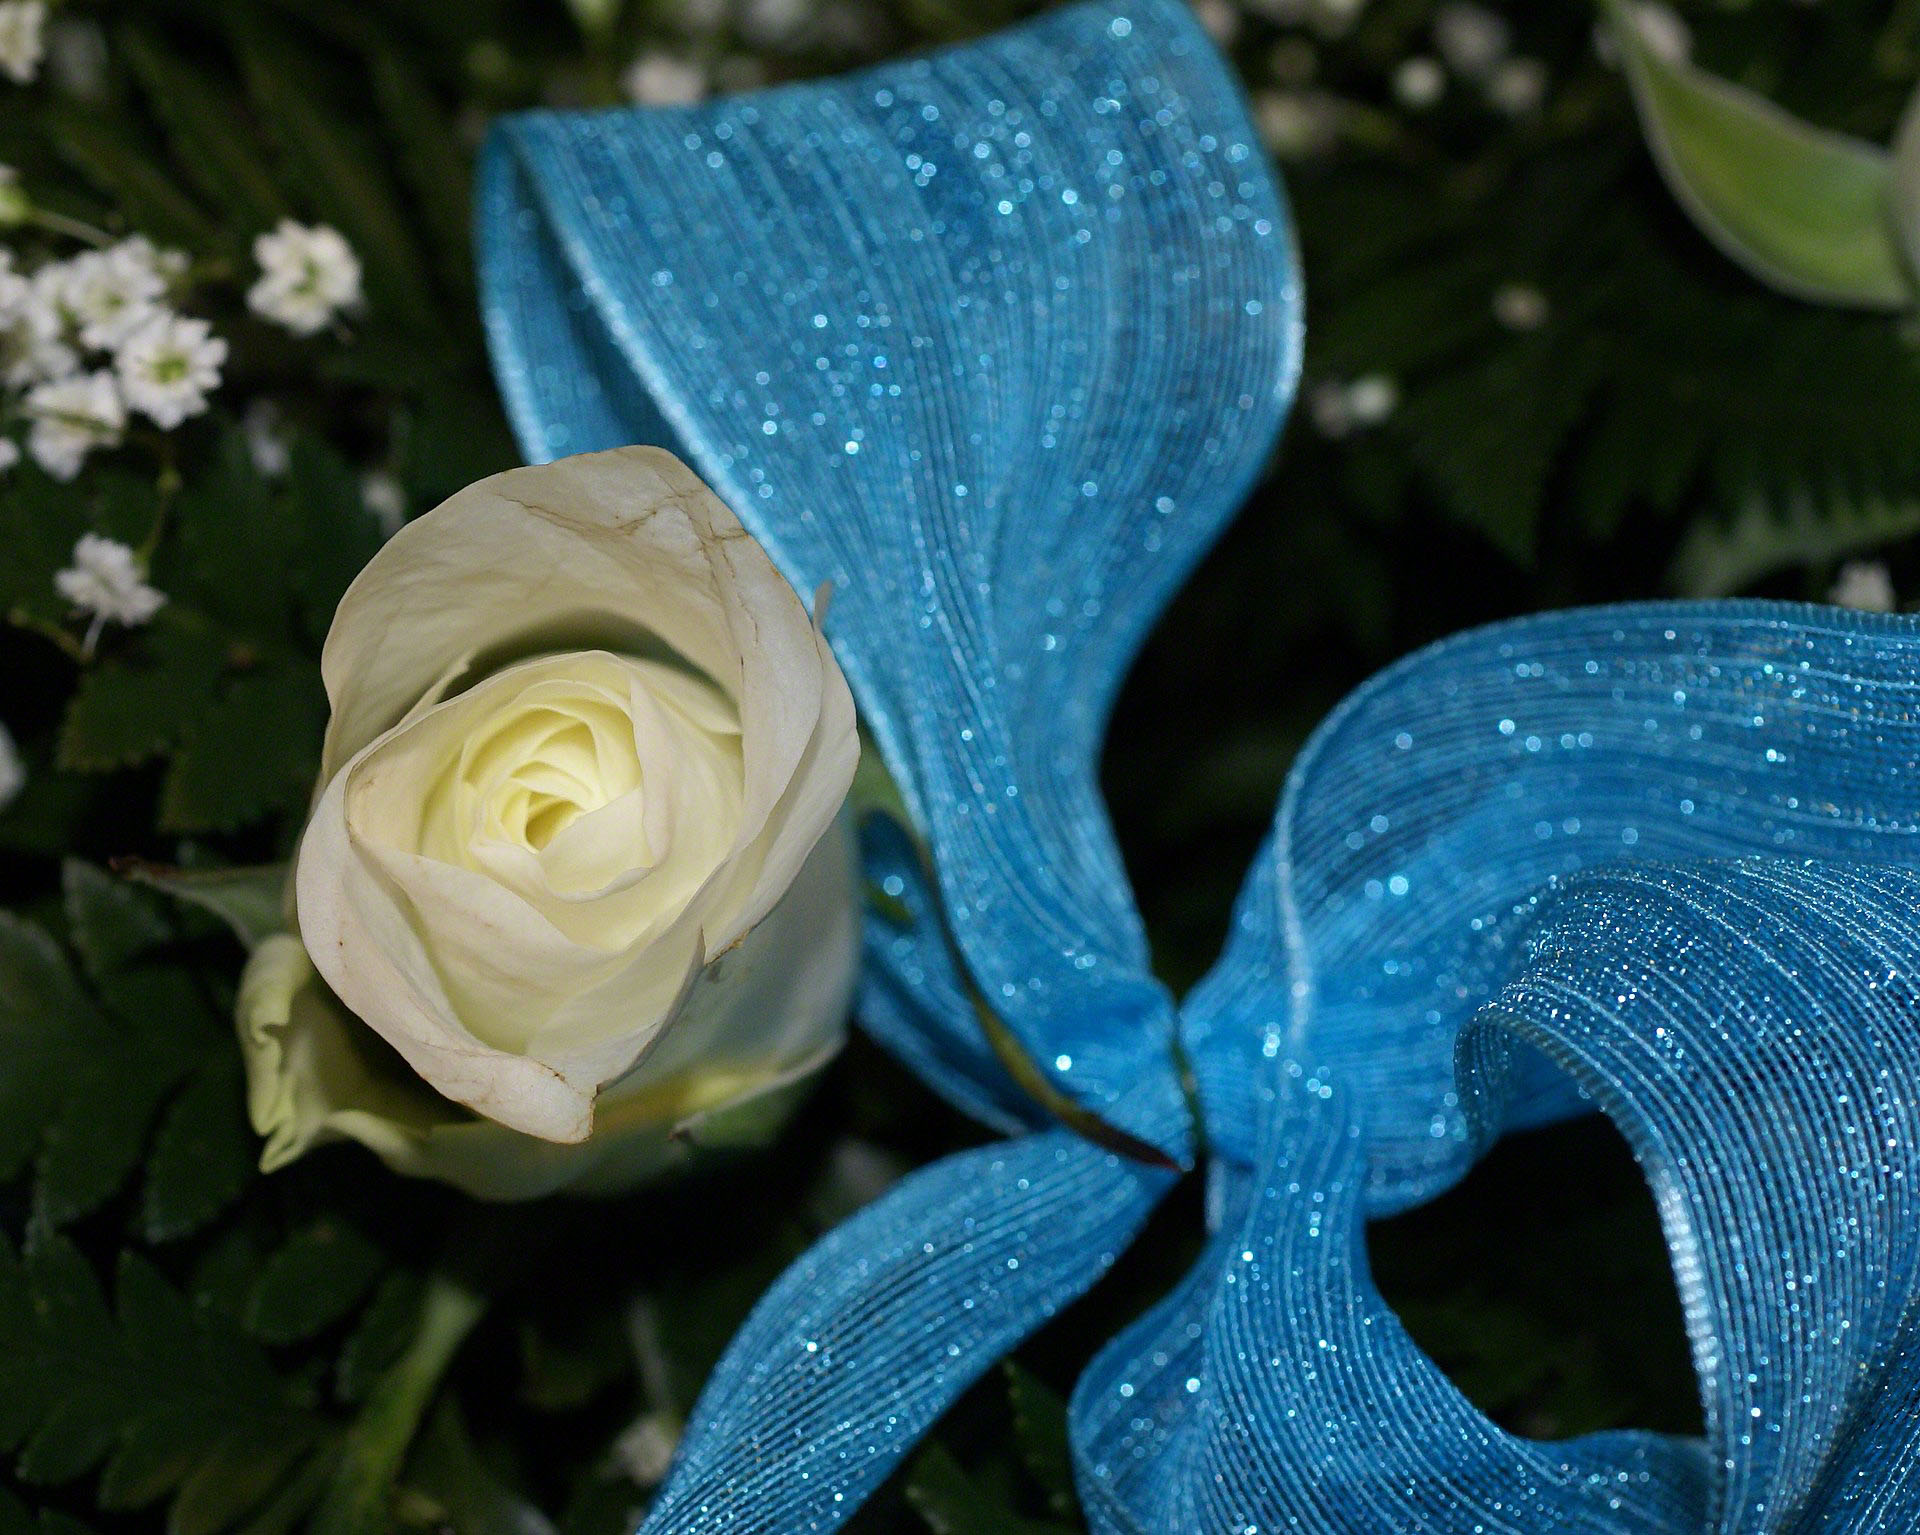 http://www.fabiovisentin.com/photography/photo/12/white-rose-bouquet-0265310.jpg